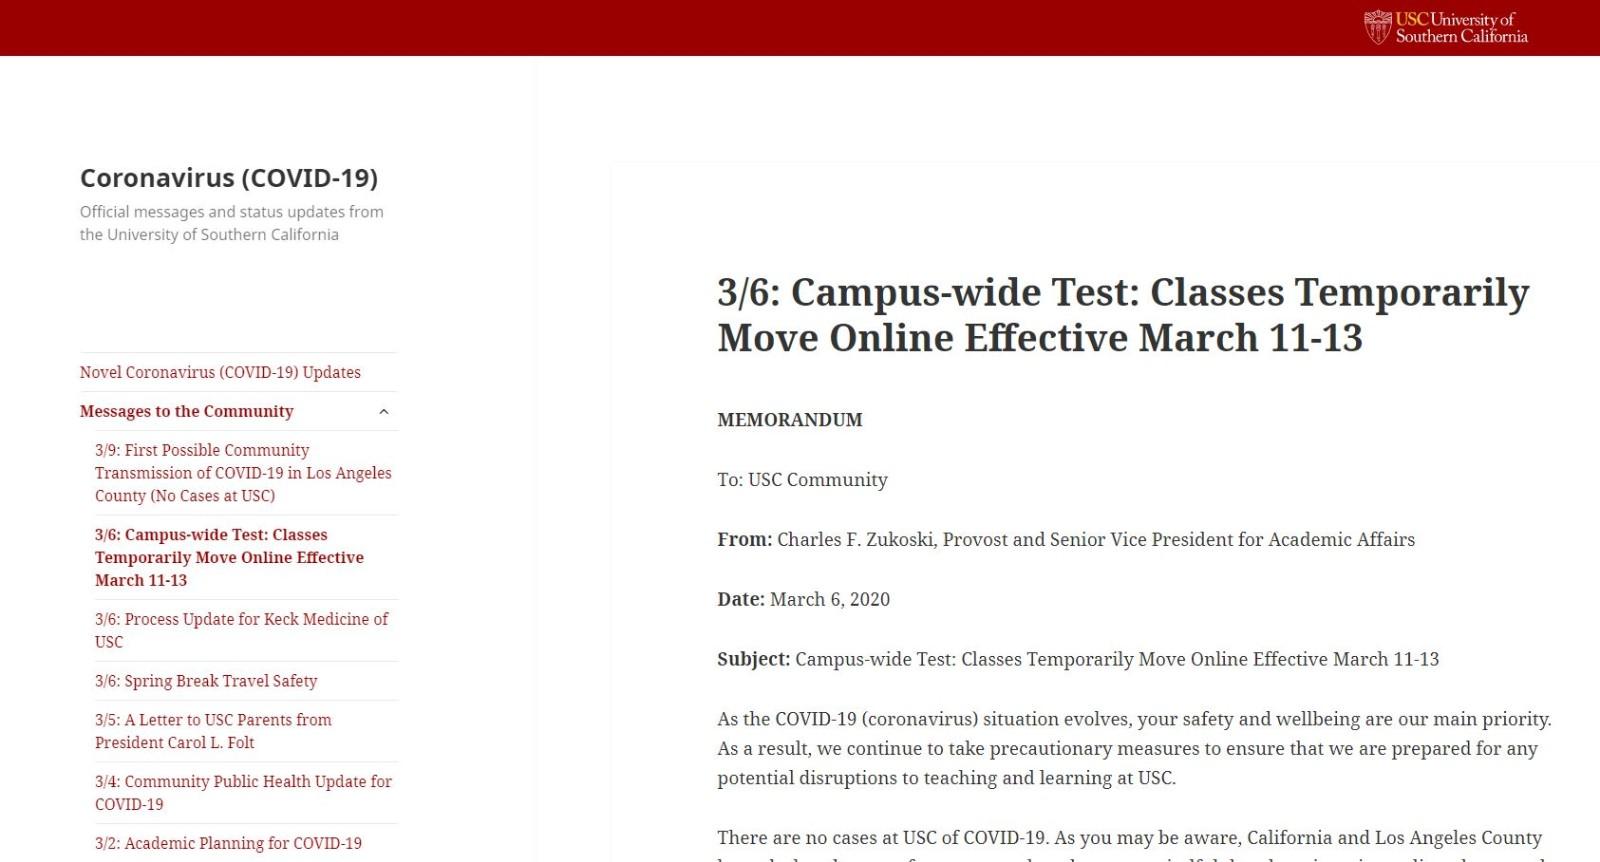 UCLA、USC 周三起停课改为网上授课_图1-5